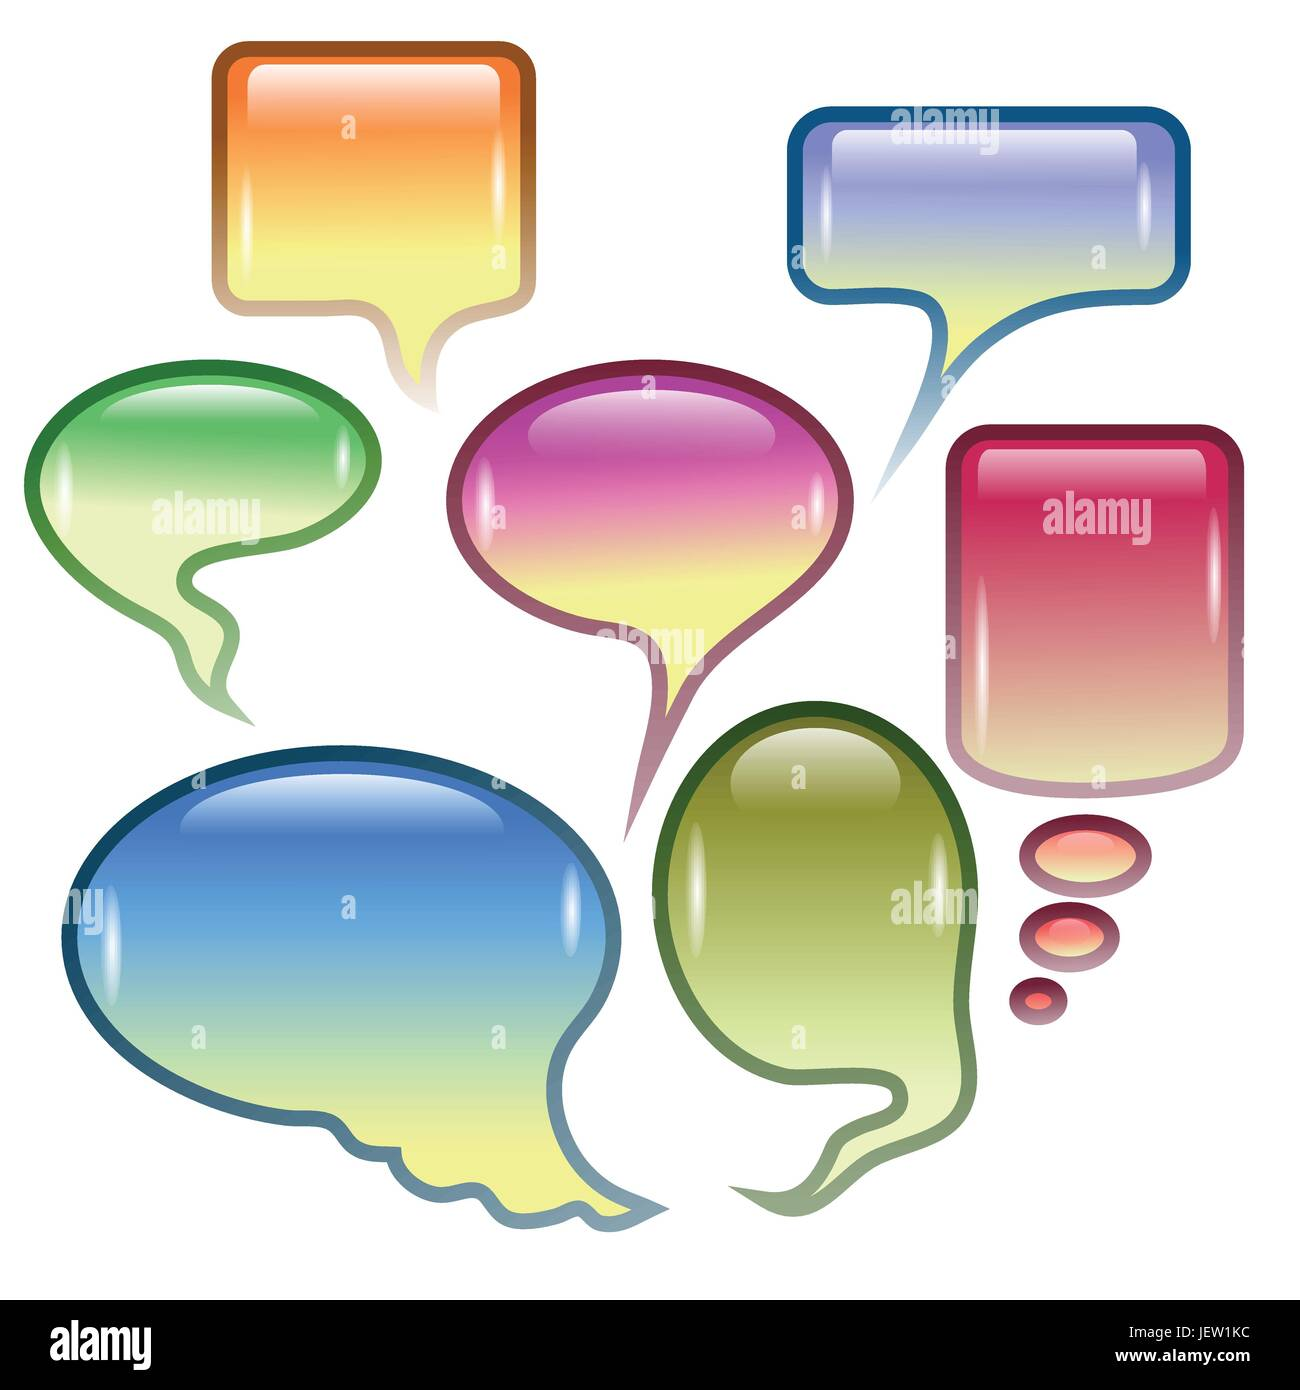 answer advice - Stock Image